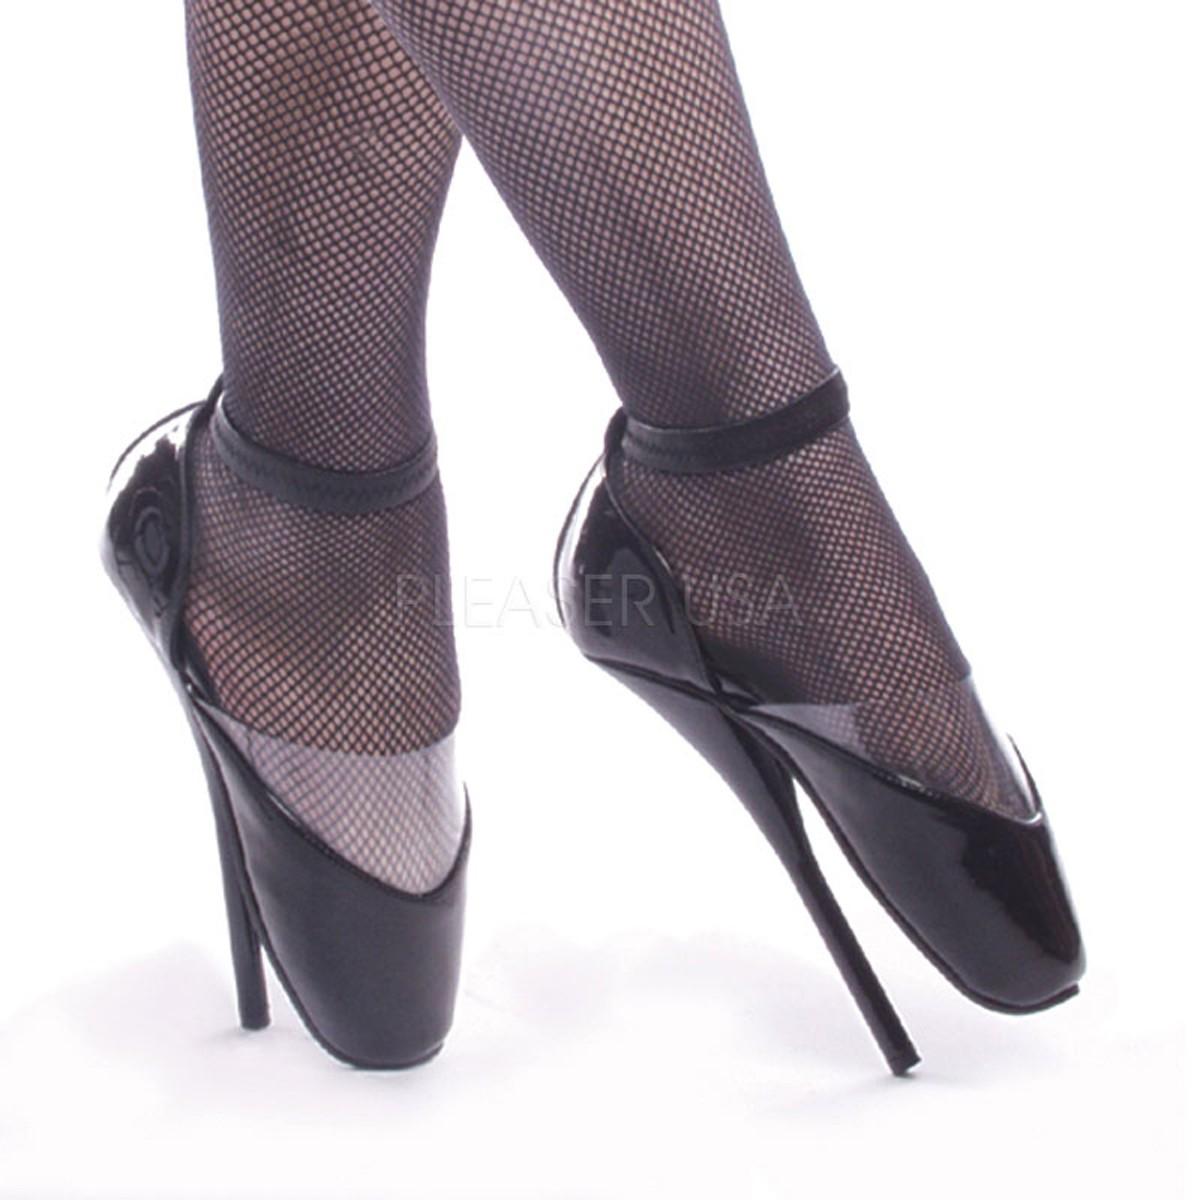 Devious Ballet-12 - extreme Fetisch High Heels 36-46